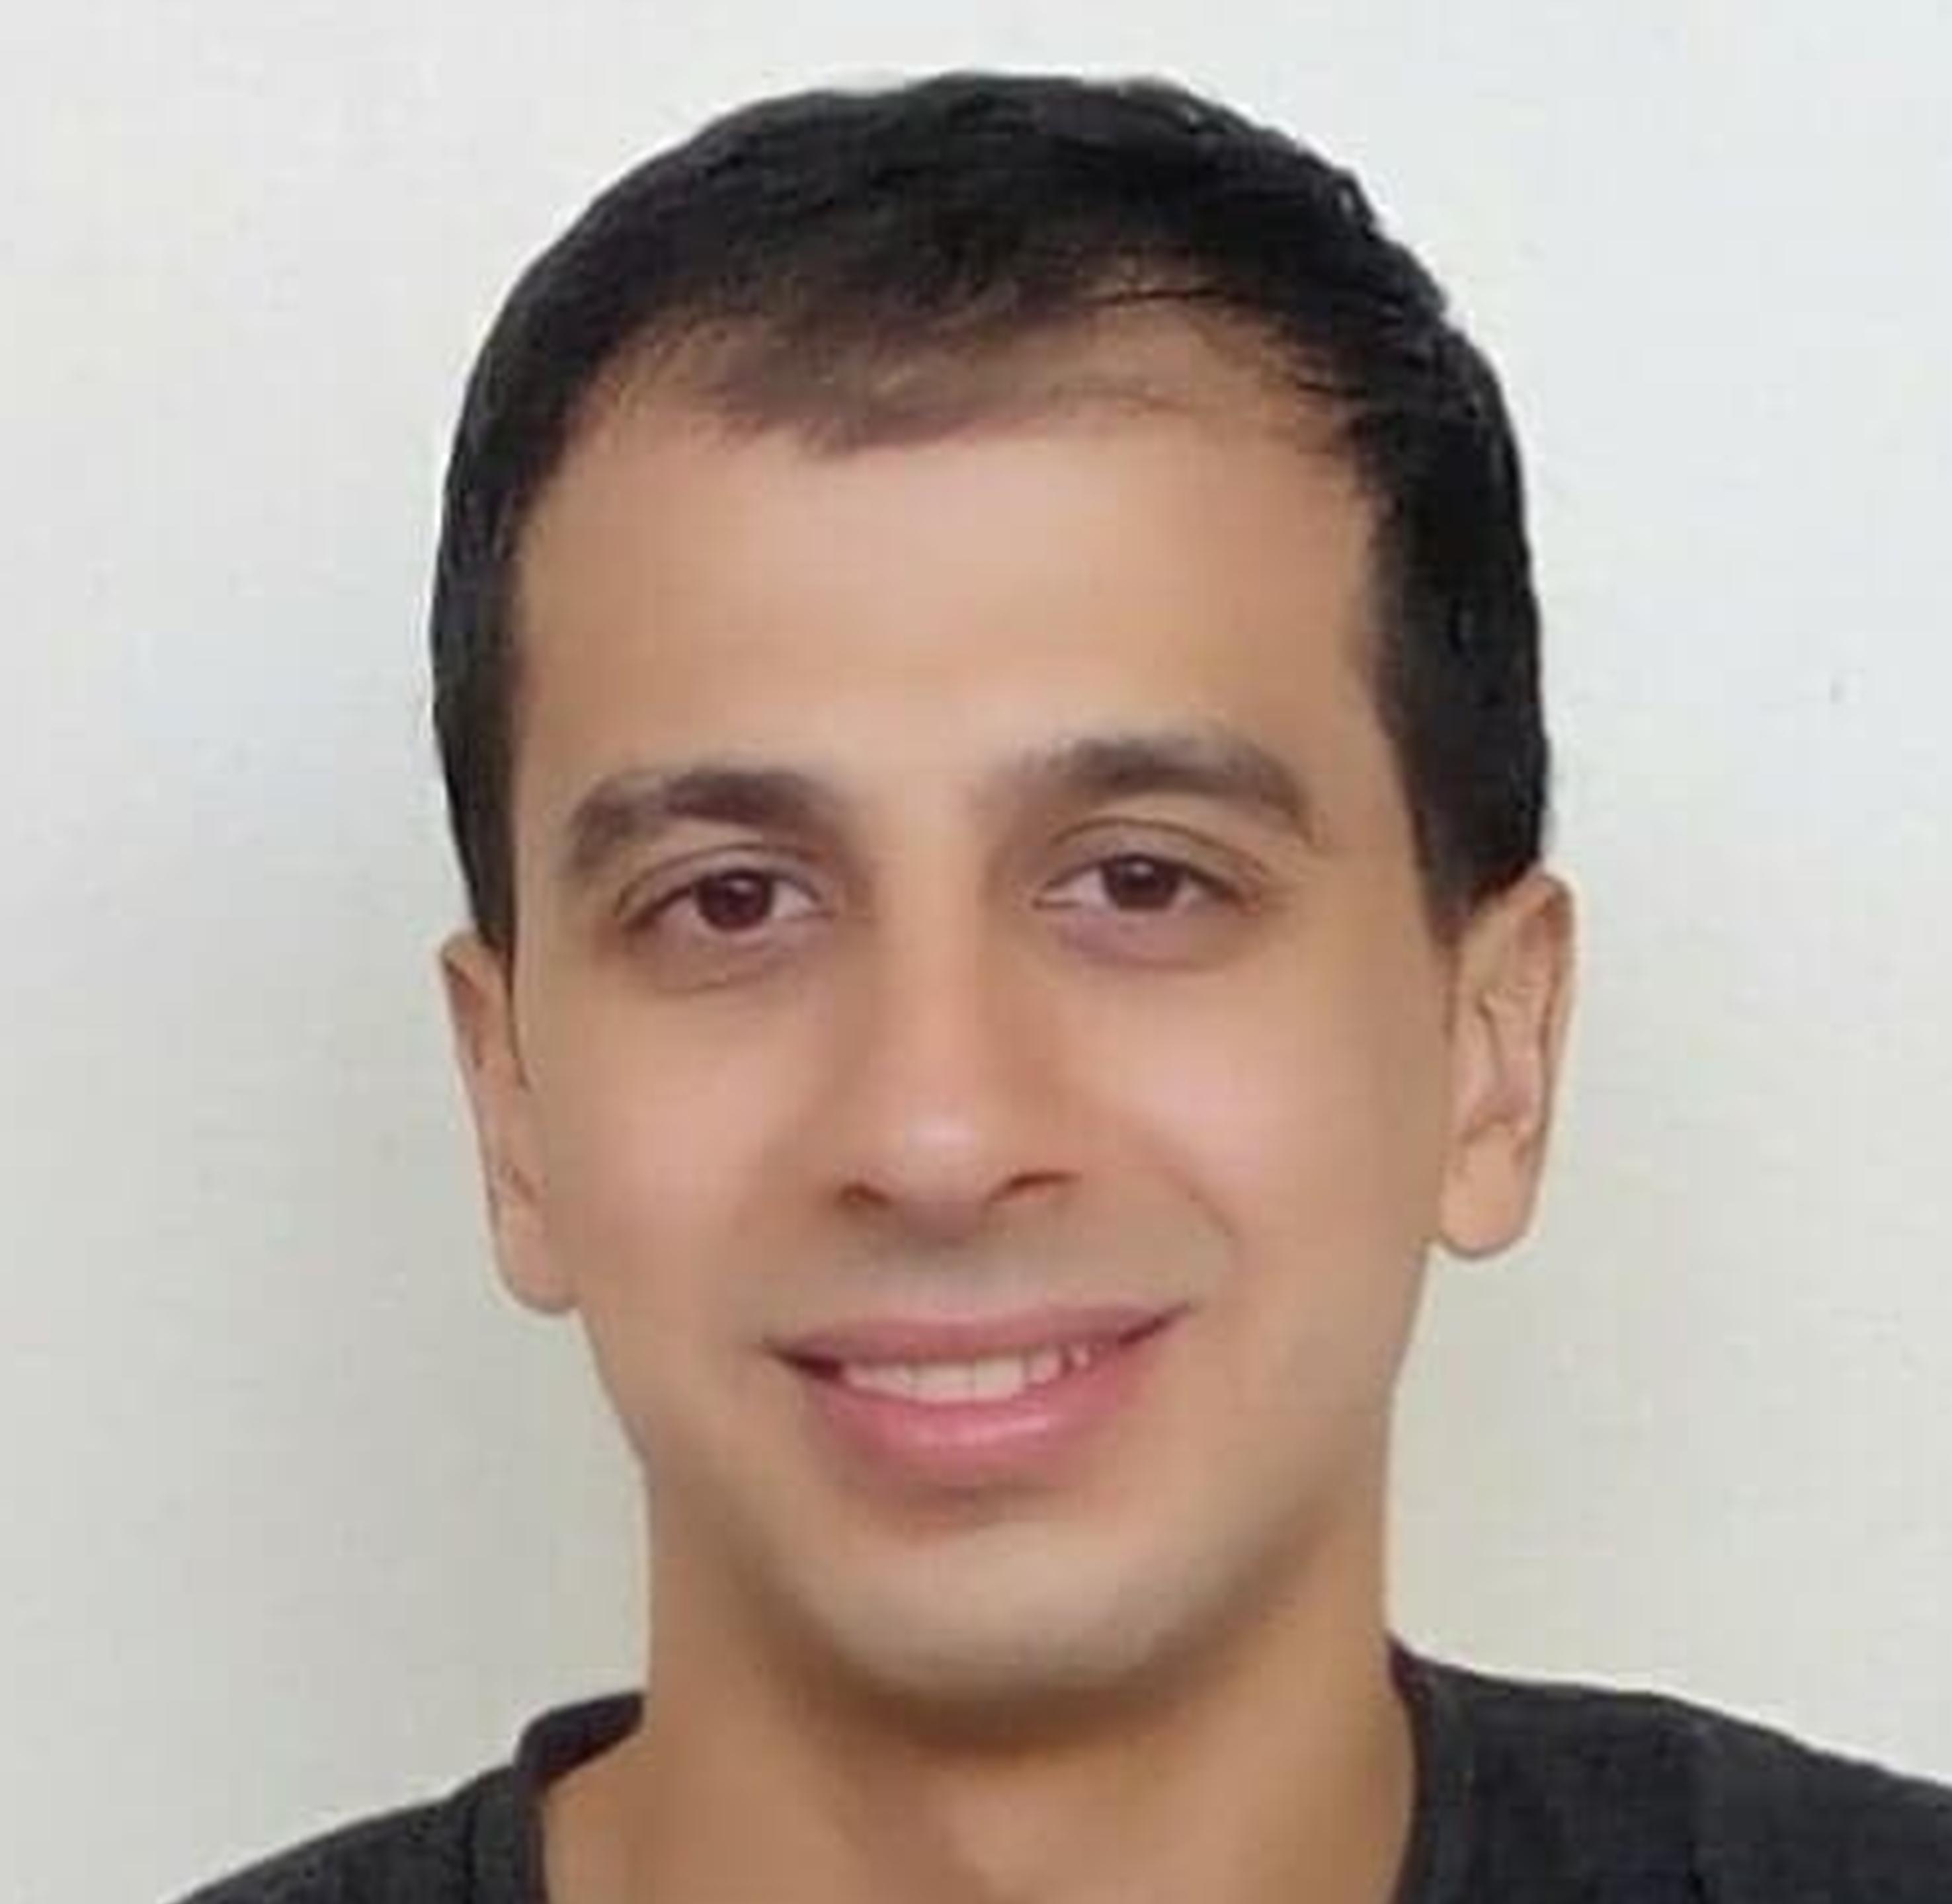 Mahmoud Khodier